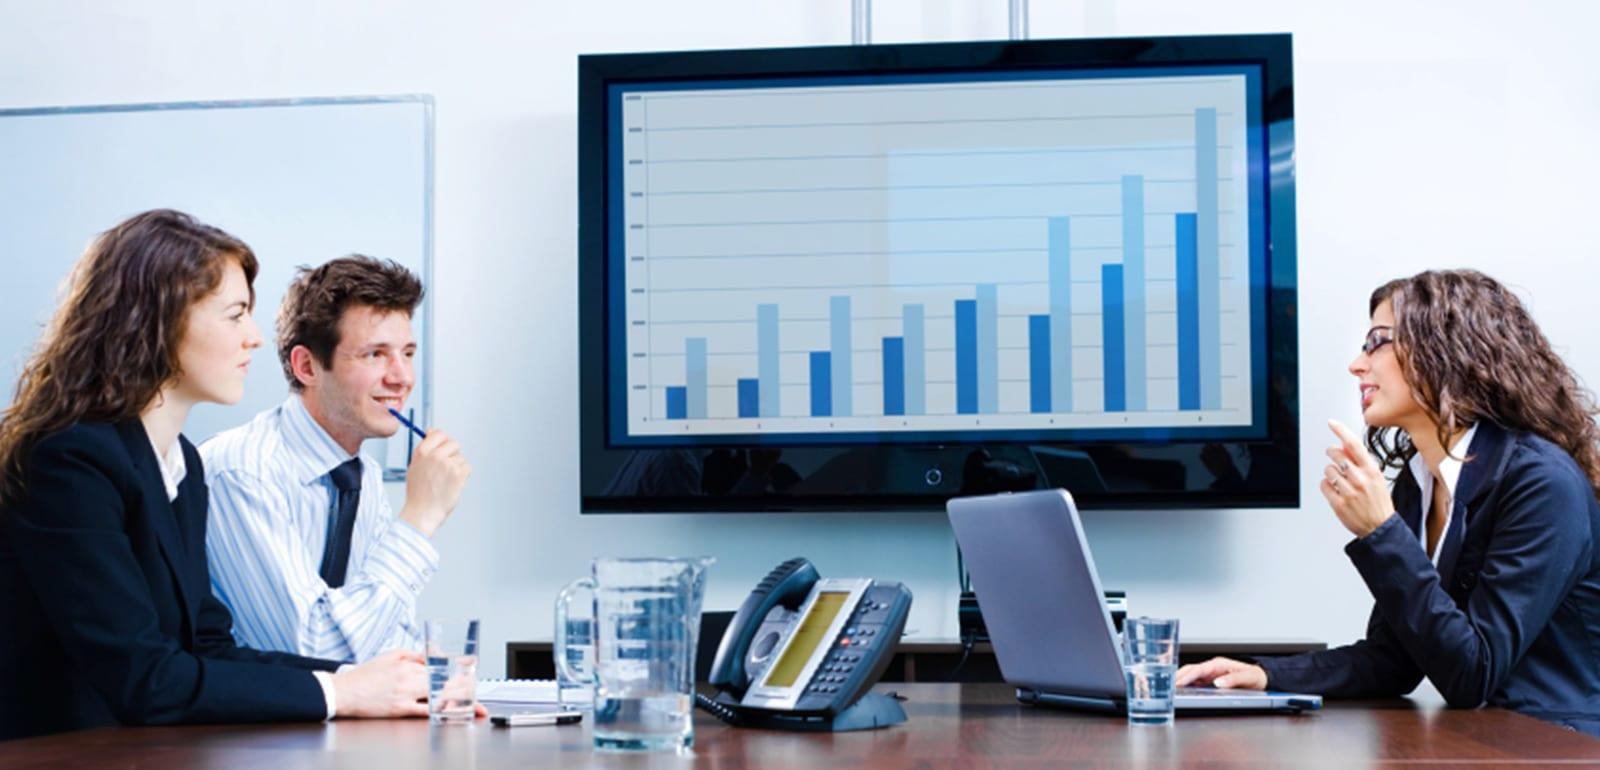 business-meeting-tv